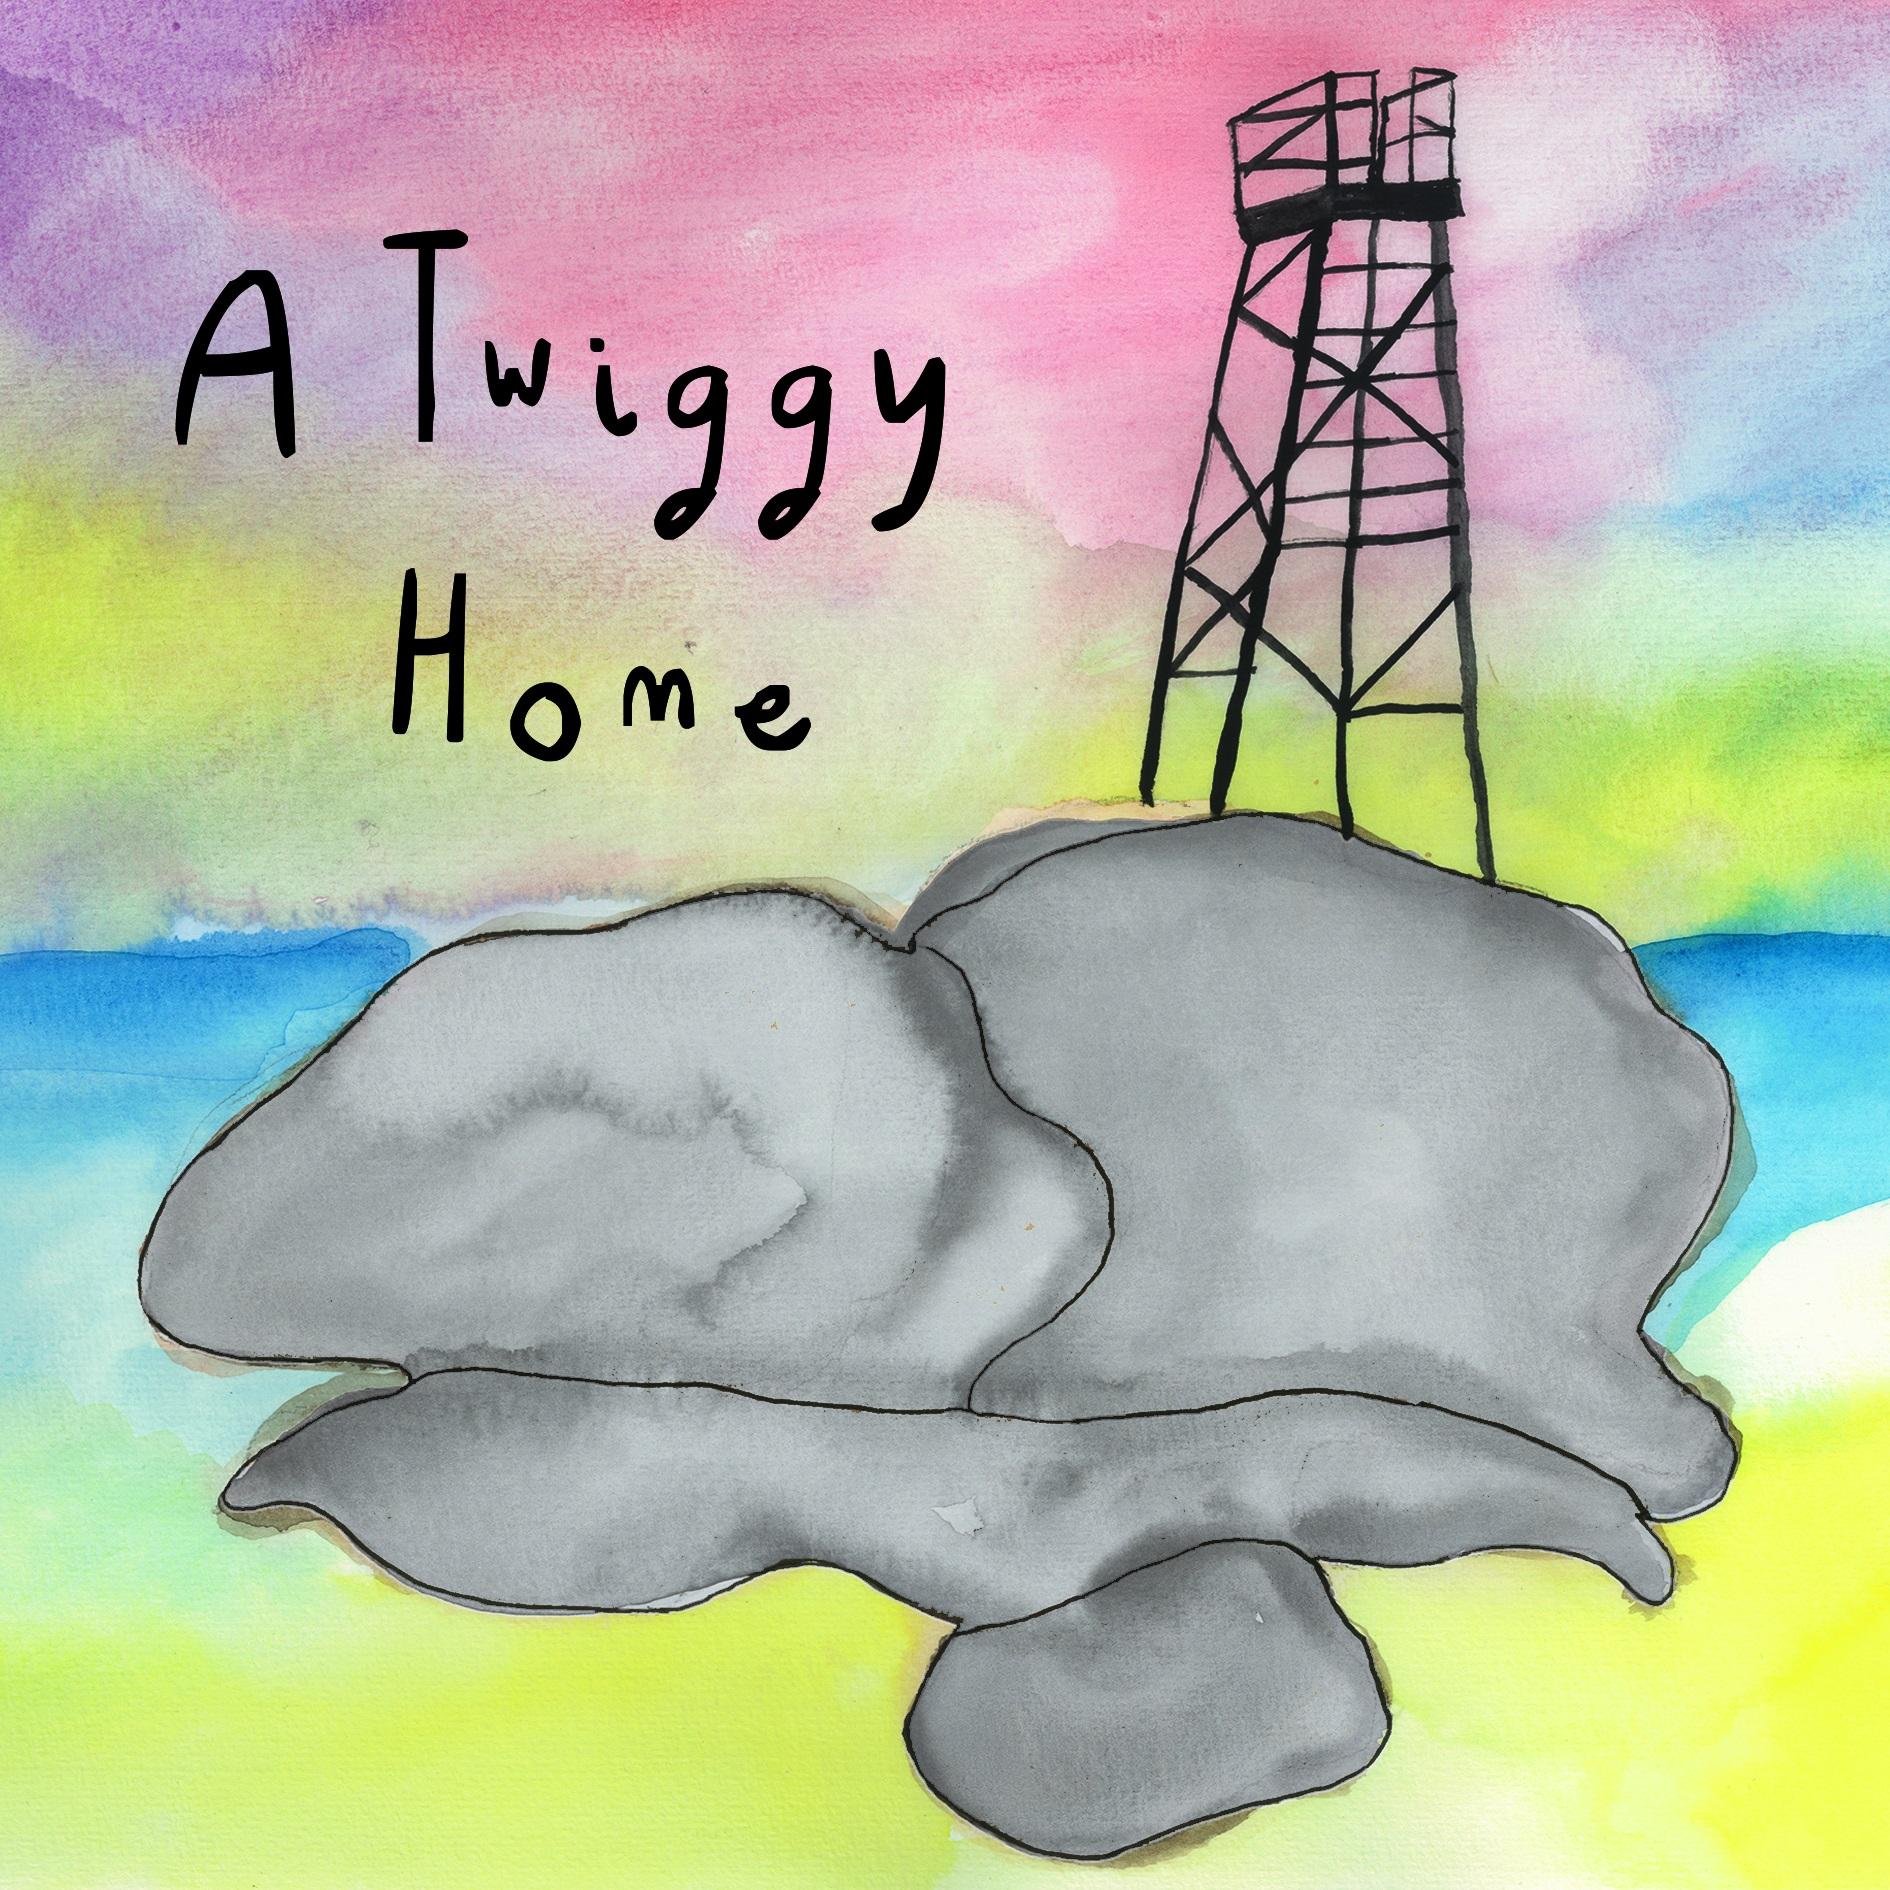 A Twiggy Home Album Art.jpg